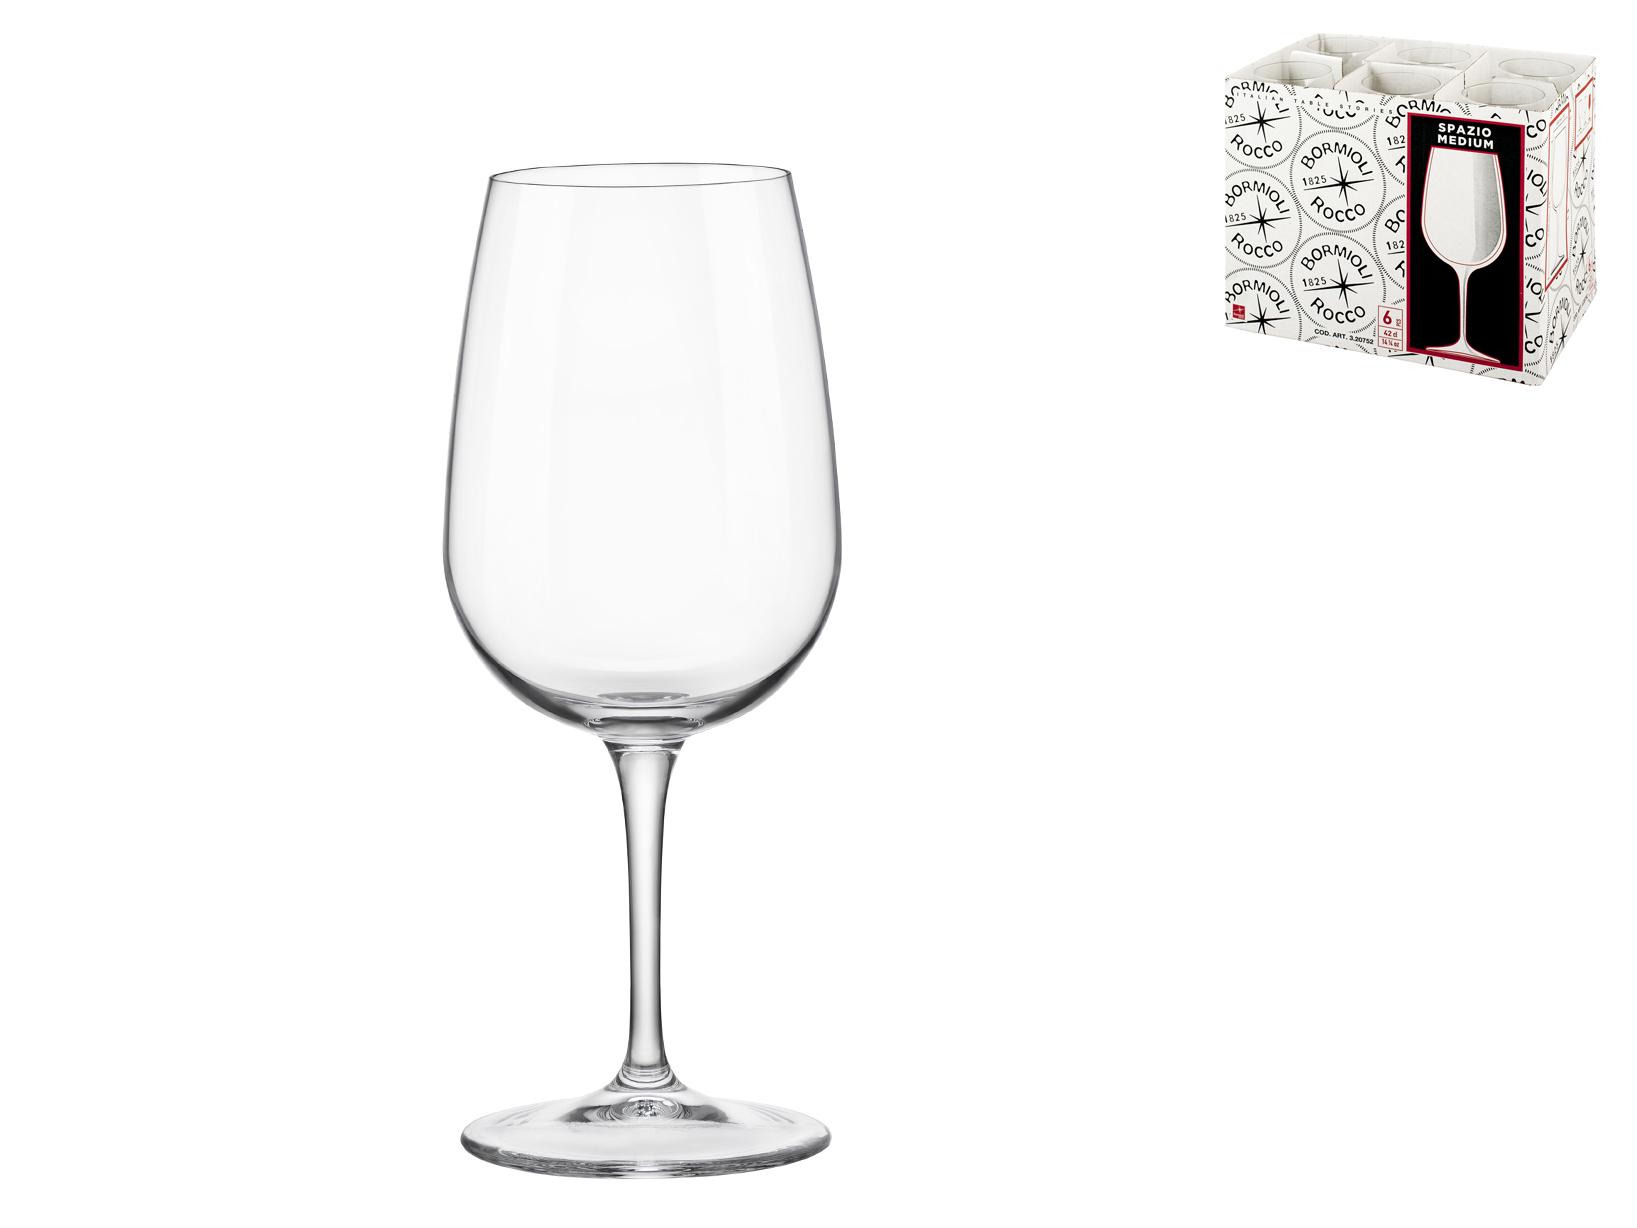 Bicchieri Da Vino Carrefour